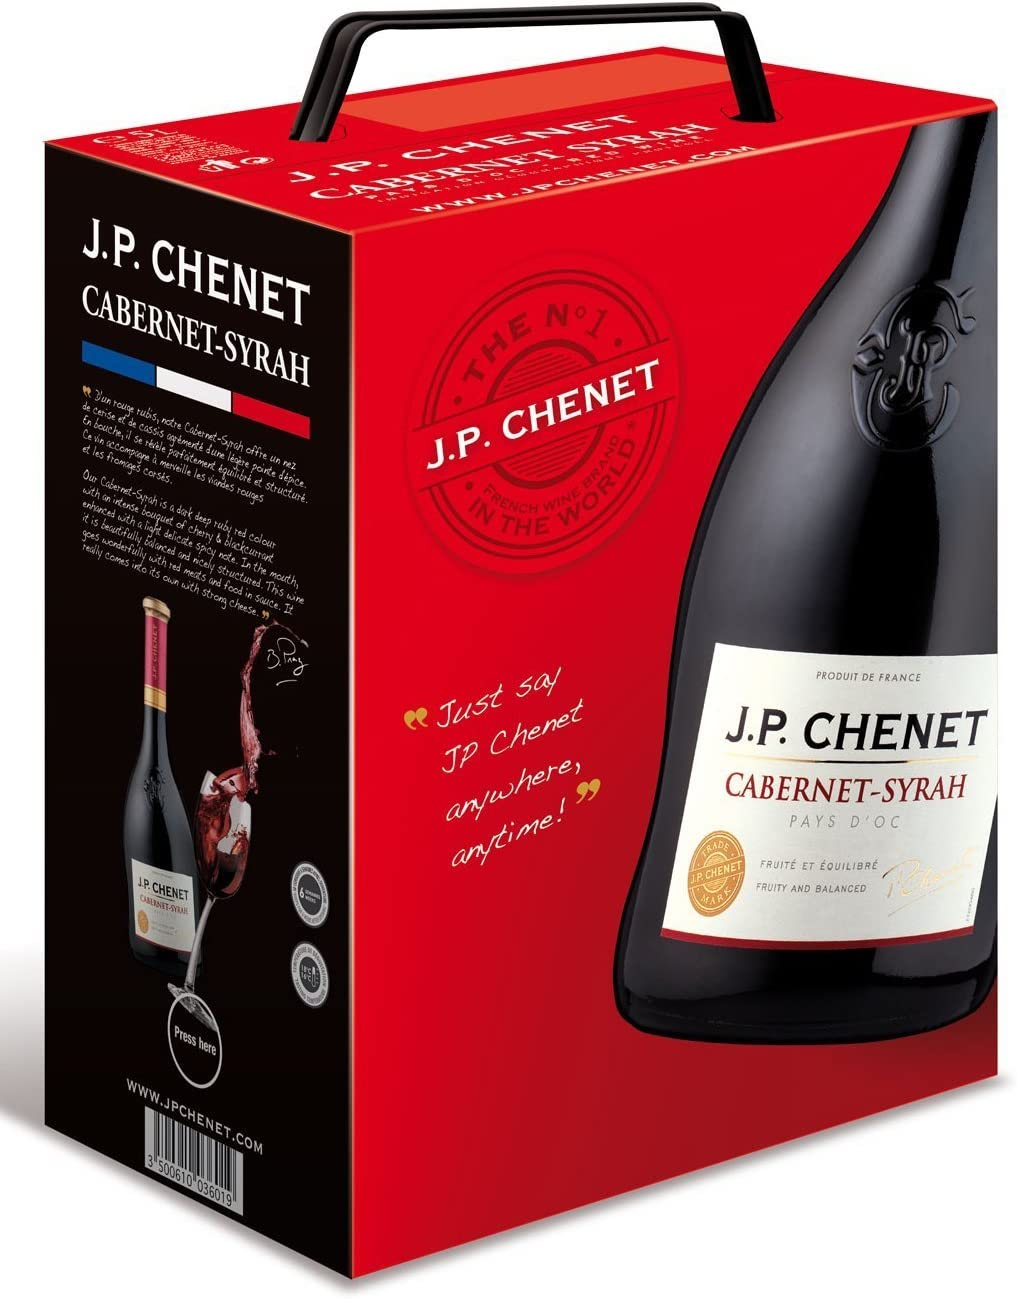 Jp Chenet Cabernet Syrah 5l Bag In Box Amazon Co Uk Grocery